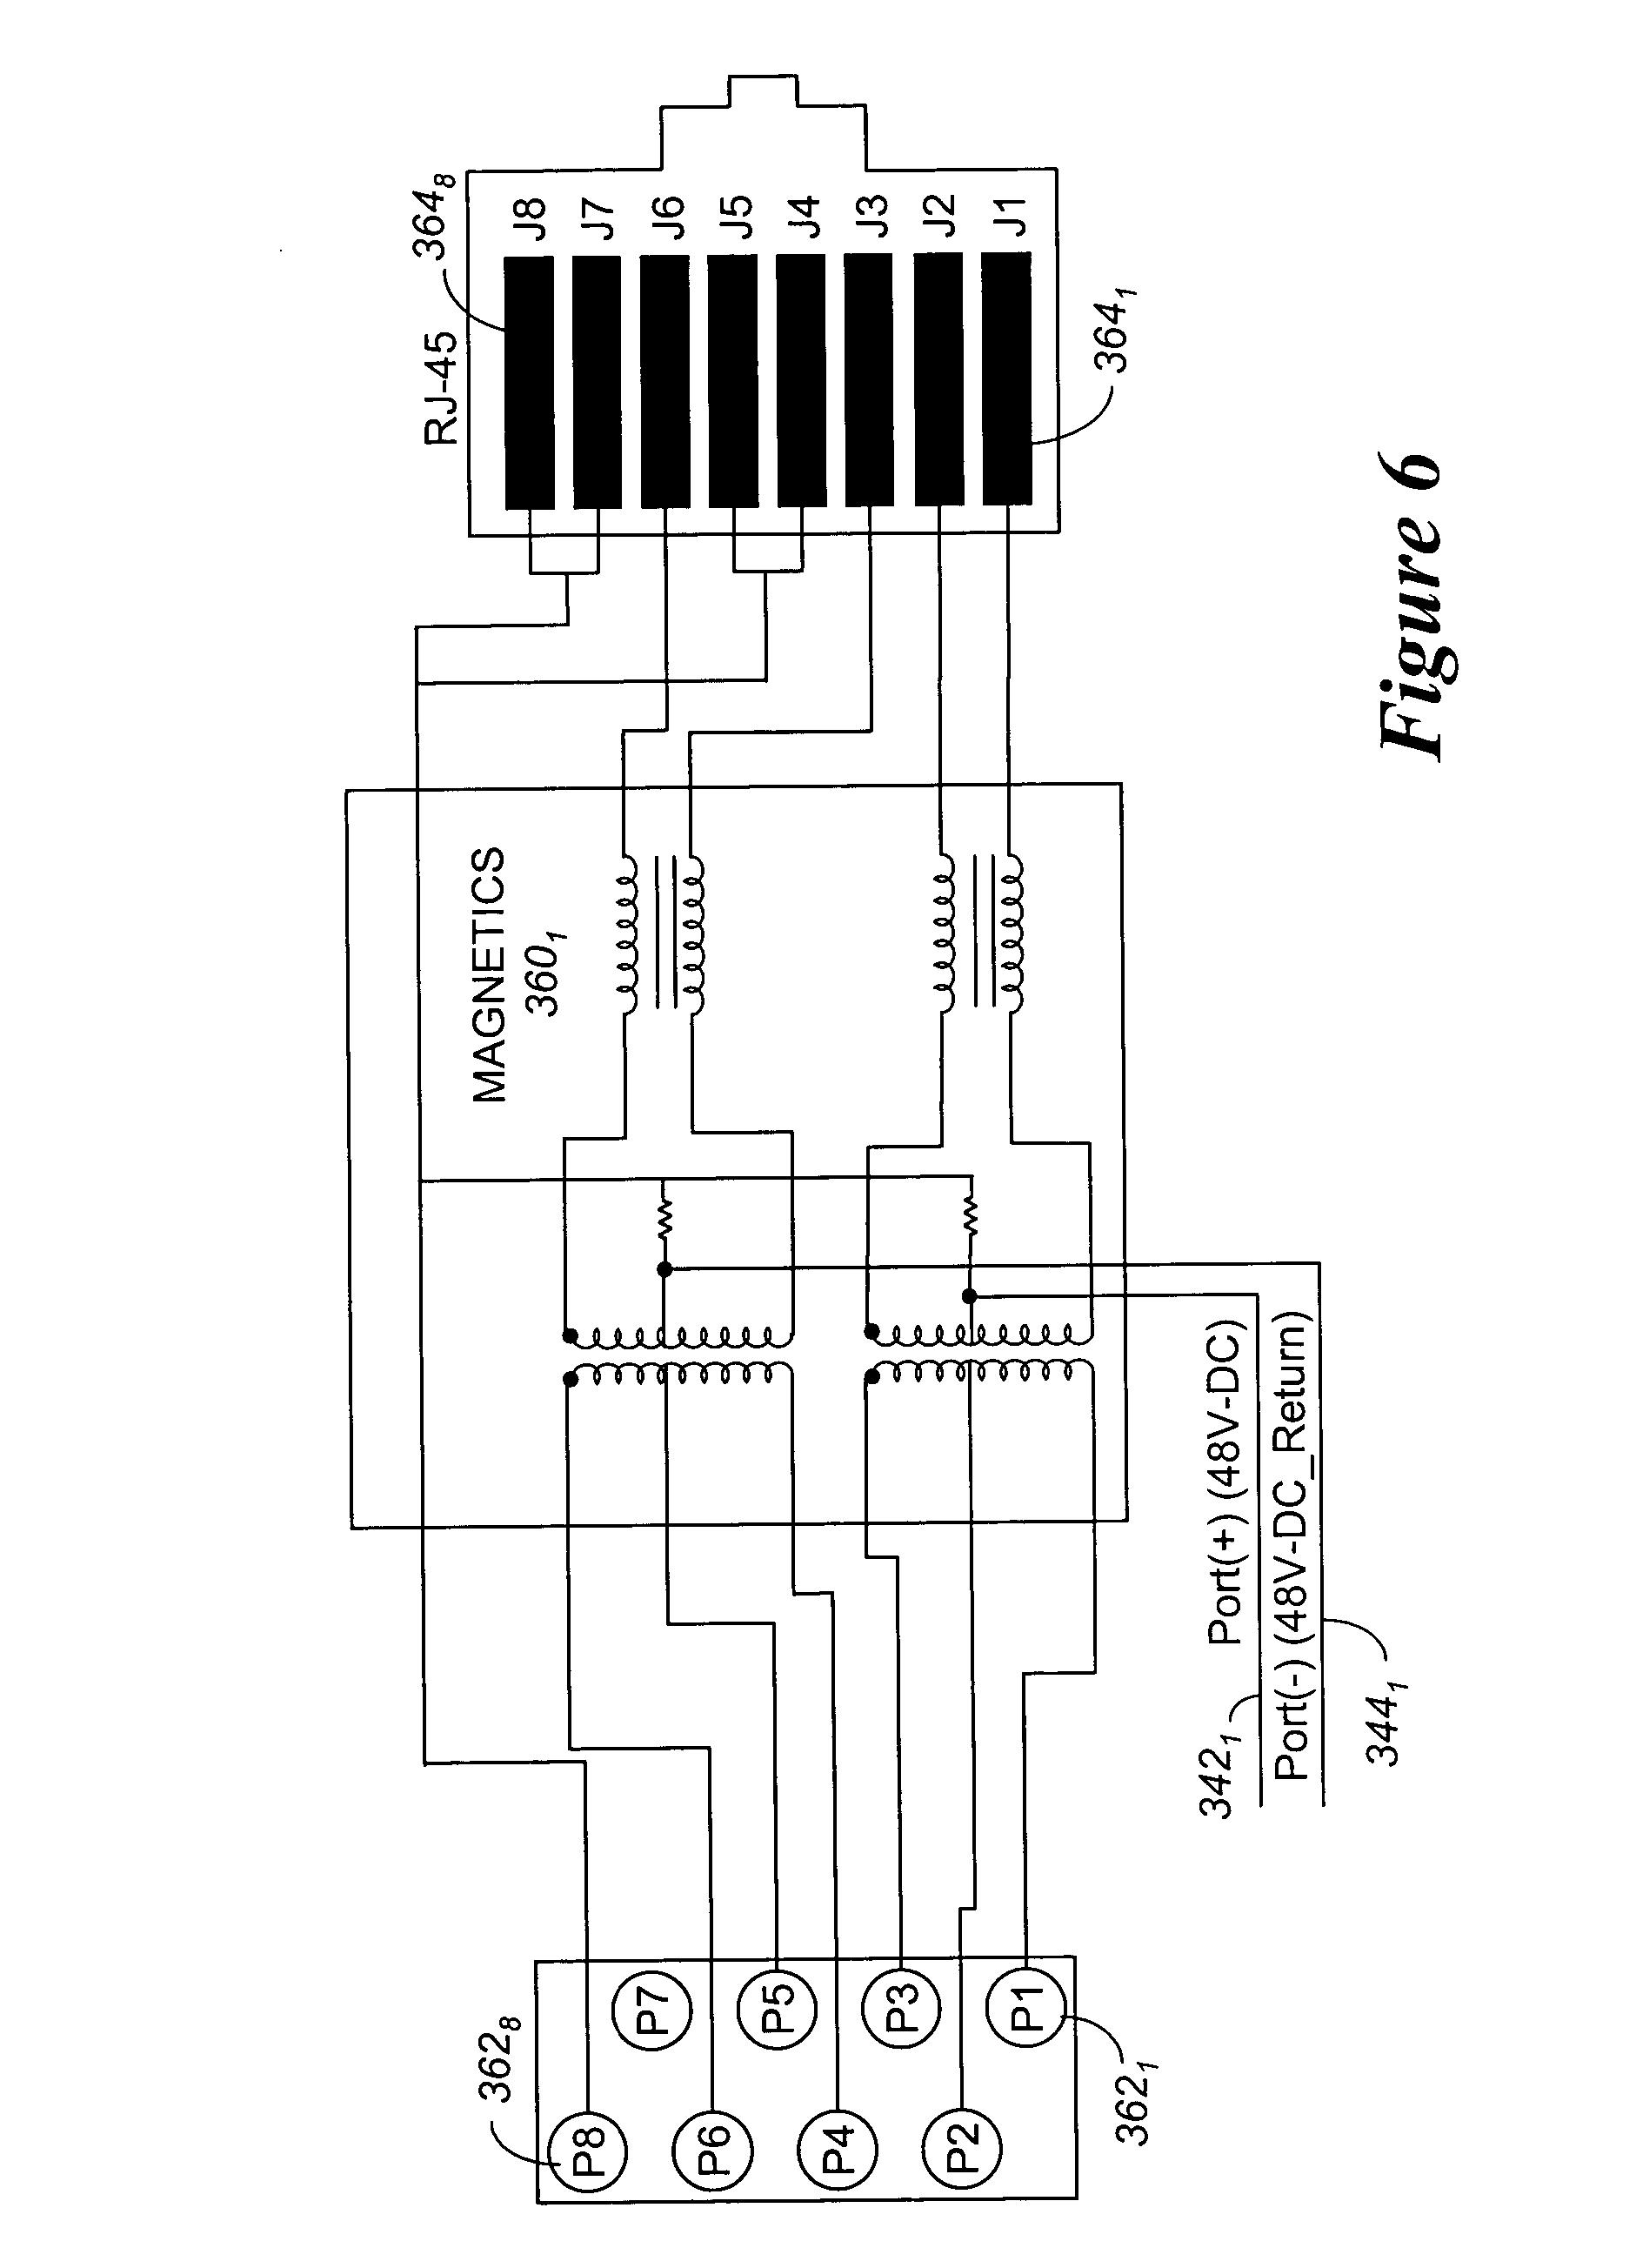 ethernet plug wiring diagram enigmacurry